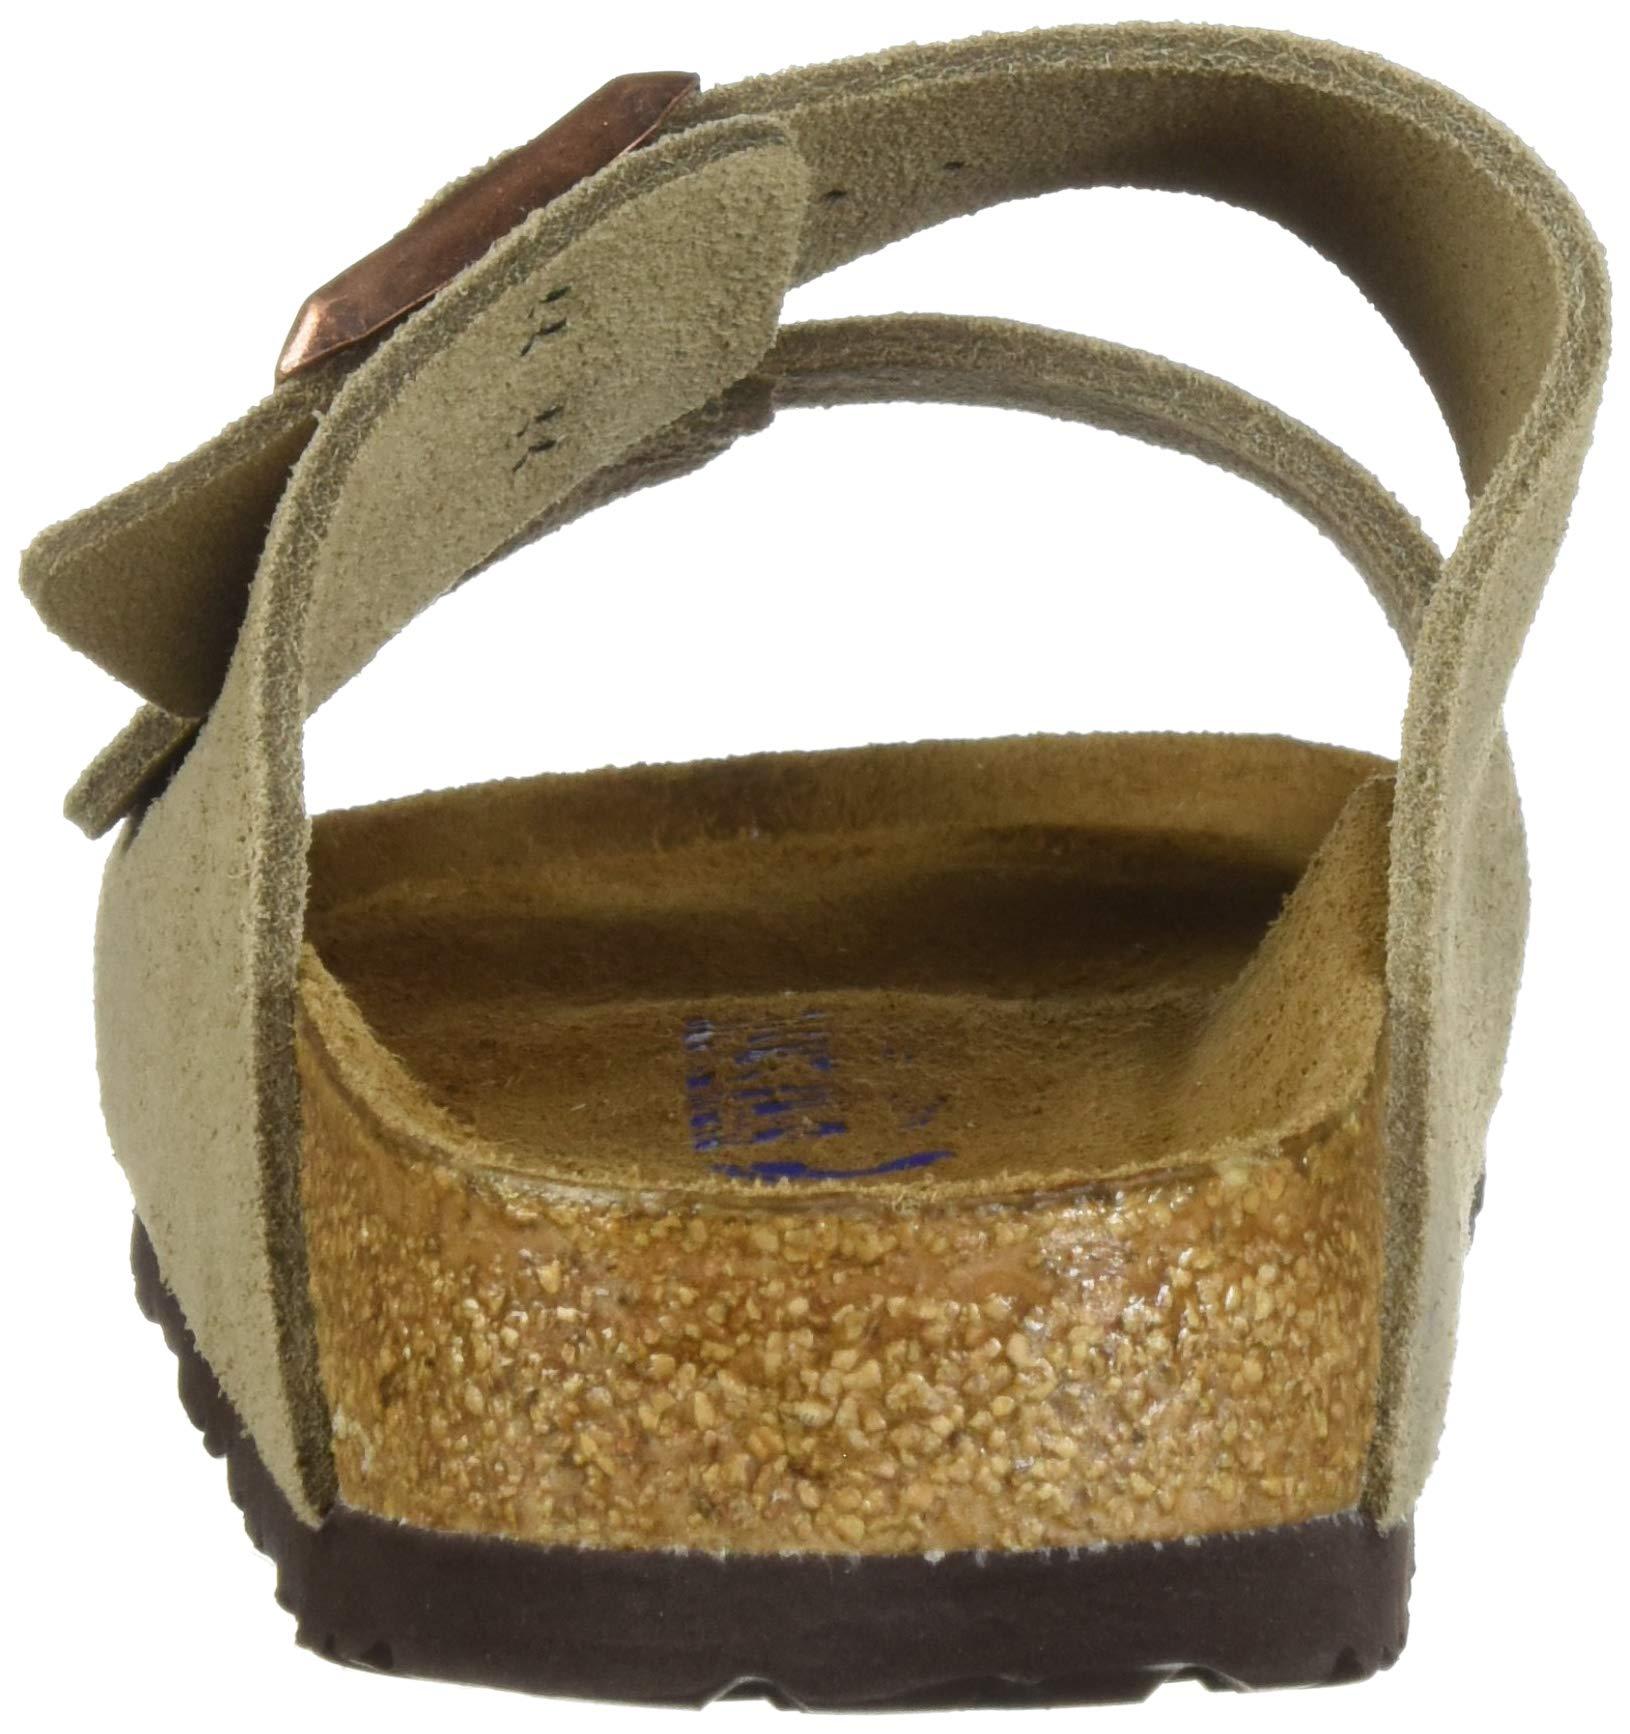 Birkenstock Arizona Soft Footbed Taupe Suede Regular Width - EU Size 35 / Women's US Sizes 4-4.5 by Birkenstock (Image #2)